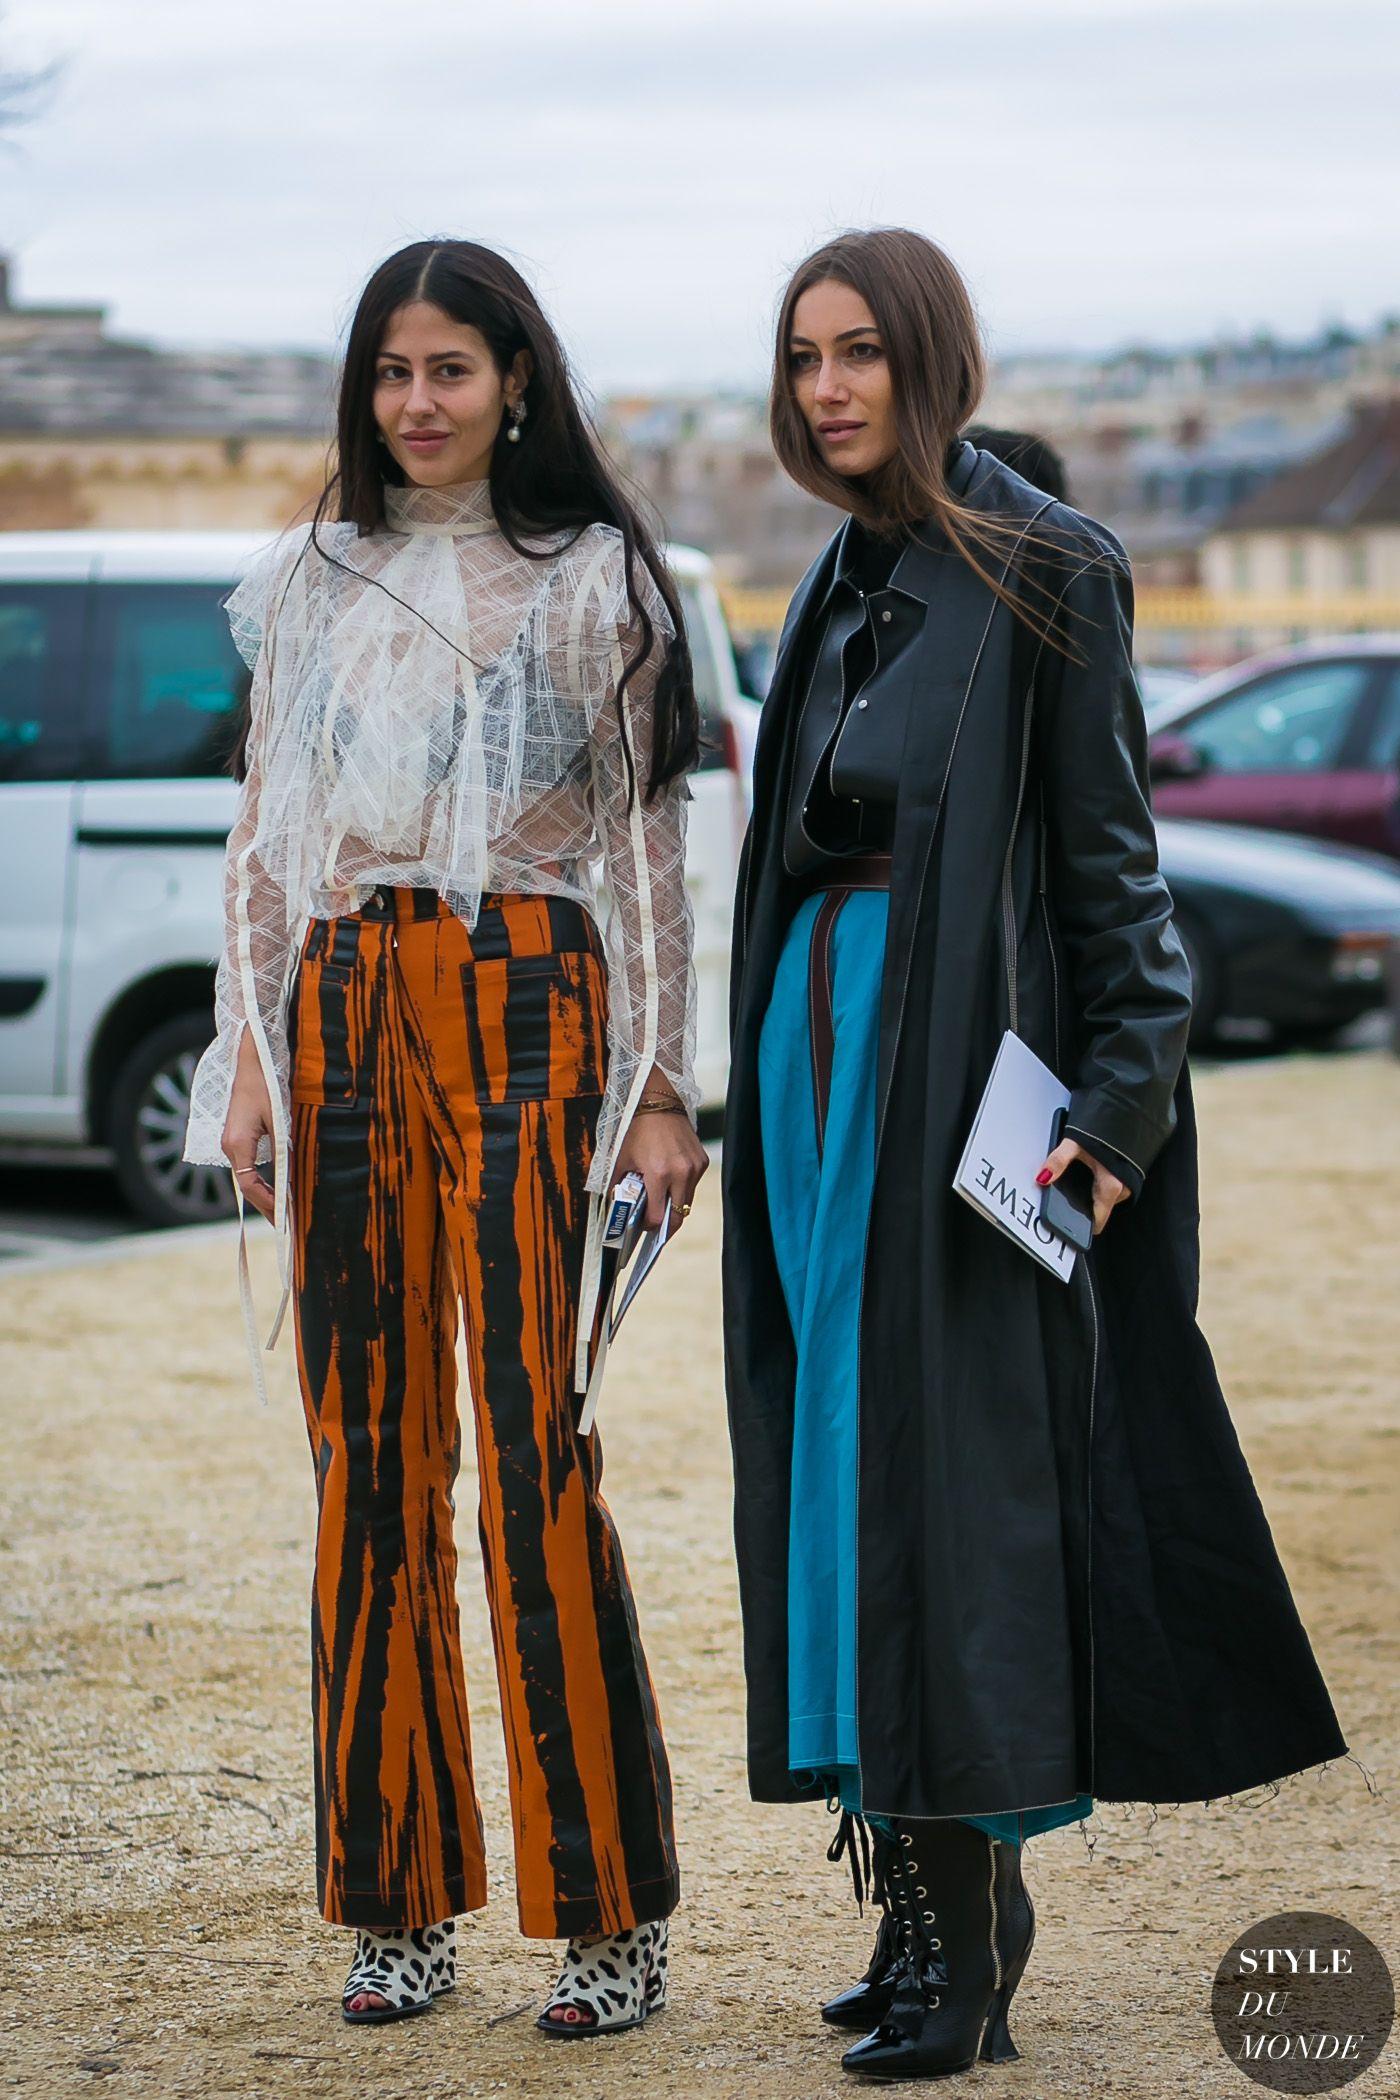 1c91c38b74 Gilda Ambrosio and Giorgia Tordini by STYLEDUMONDE Street Style Fashion  Photography